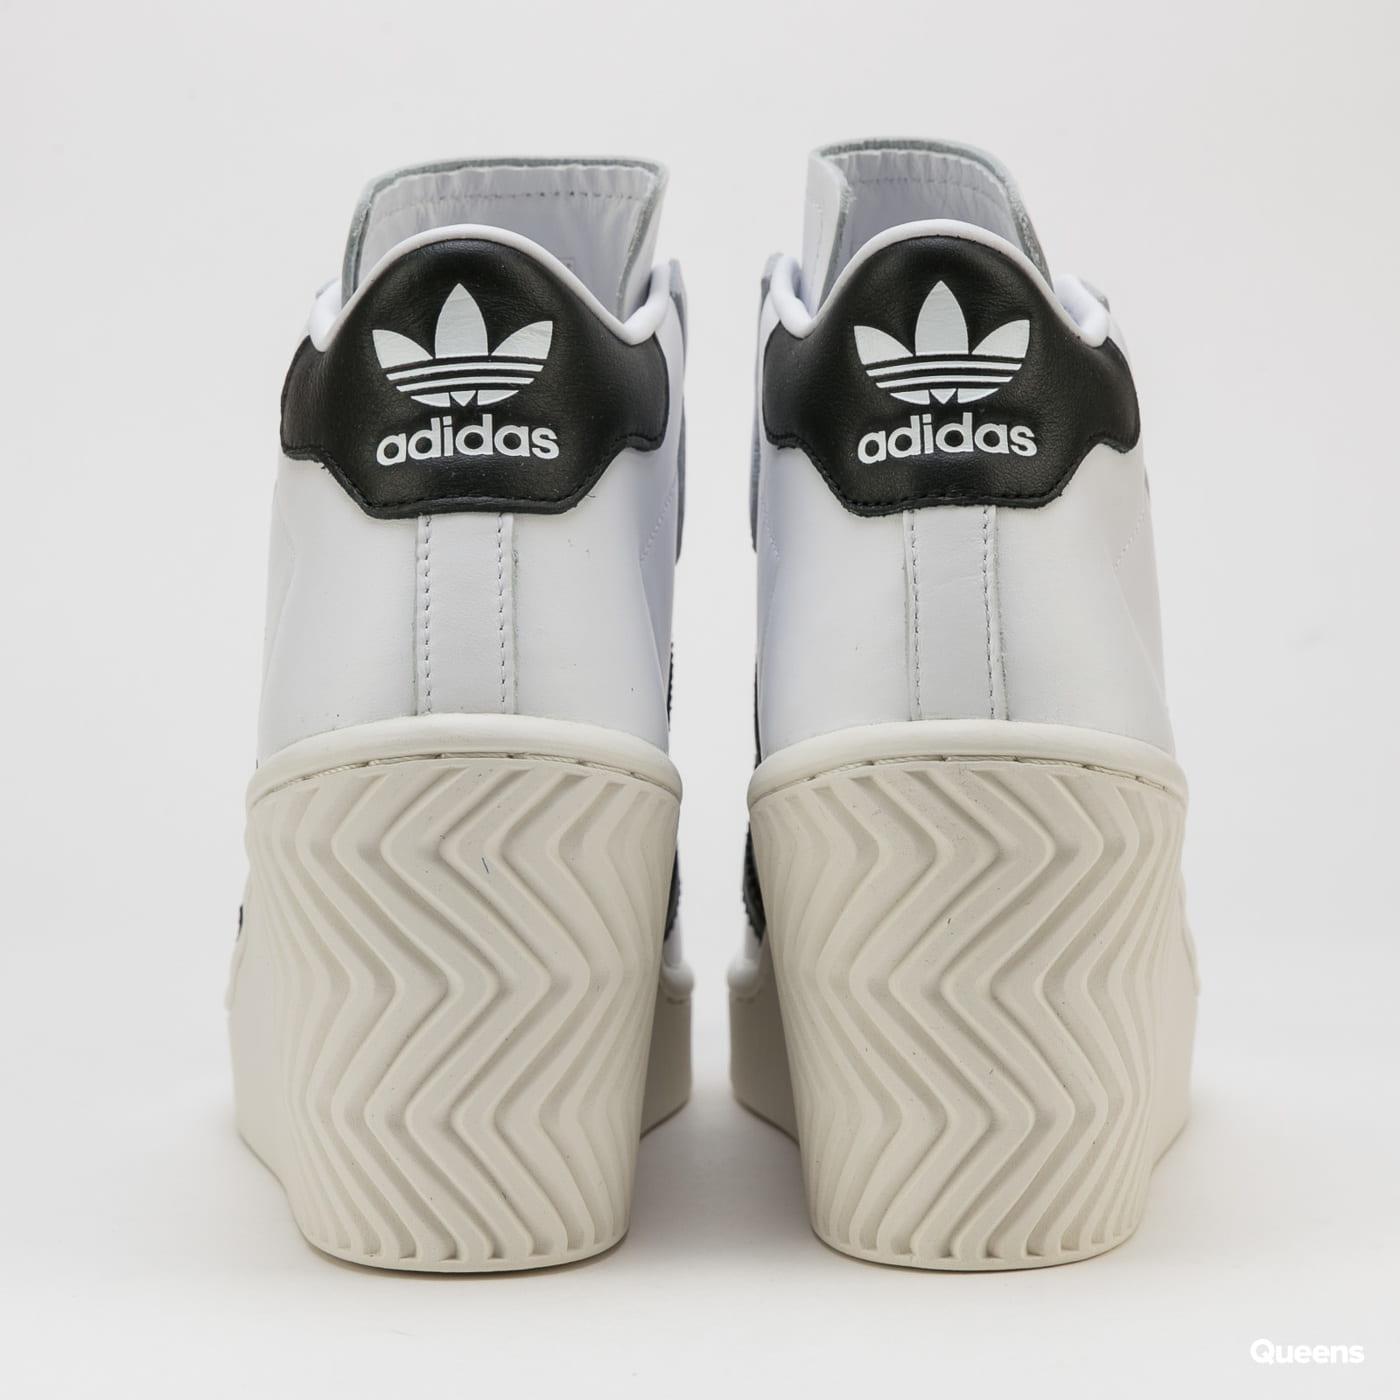 adidas Originals Superstar Ellure W ftwwht / cblack / owhite